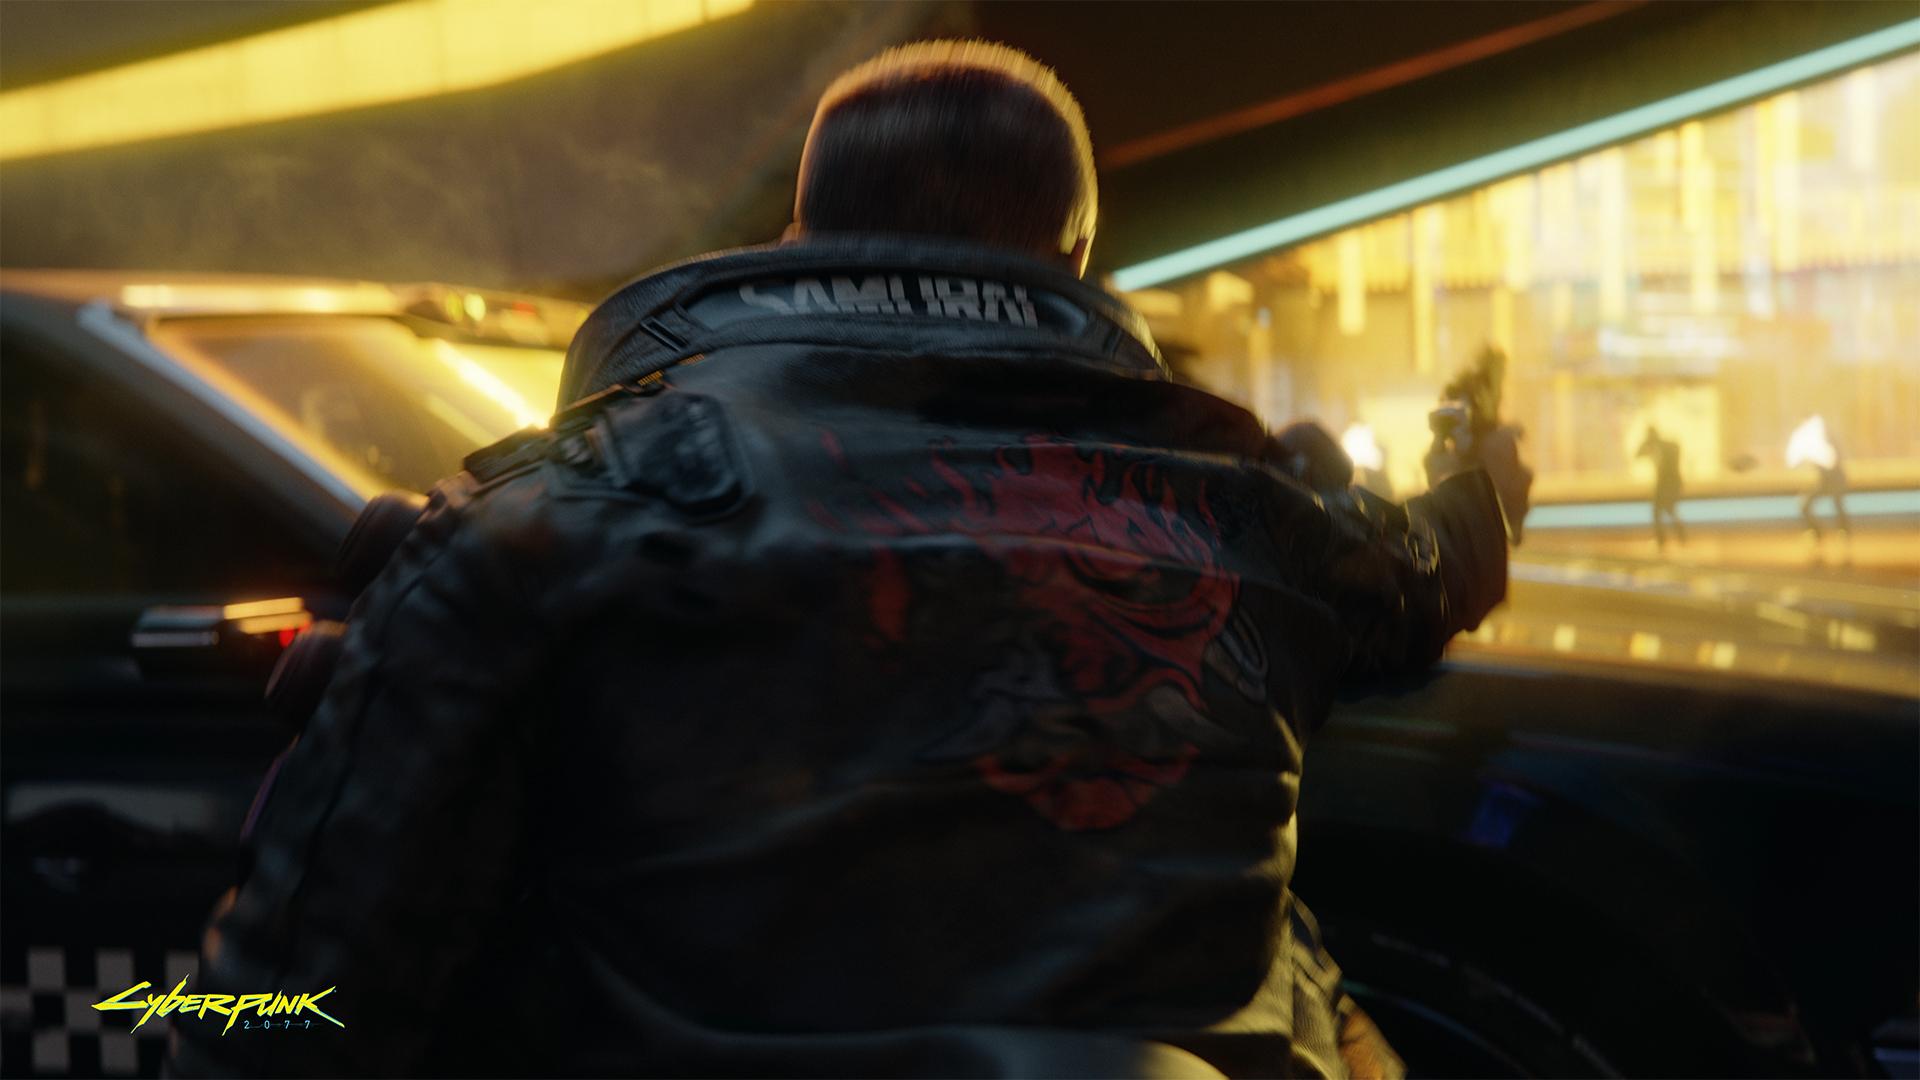 cyberpunk 2077 pre-order cancel